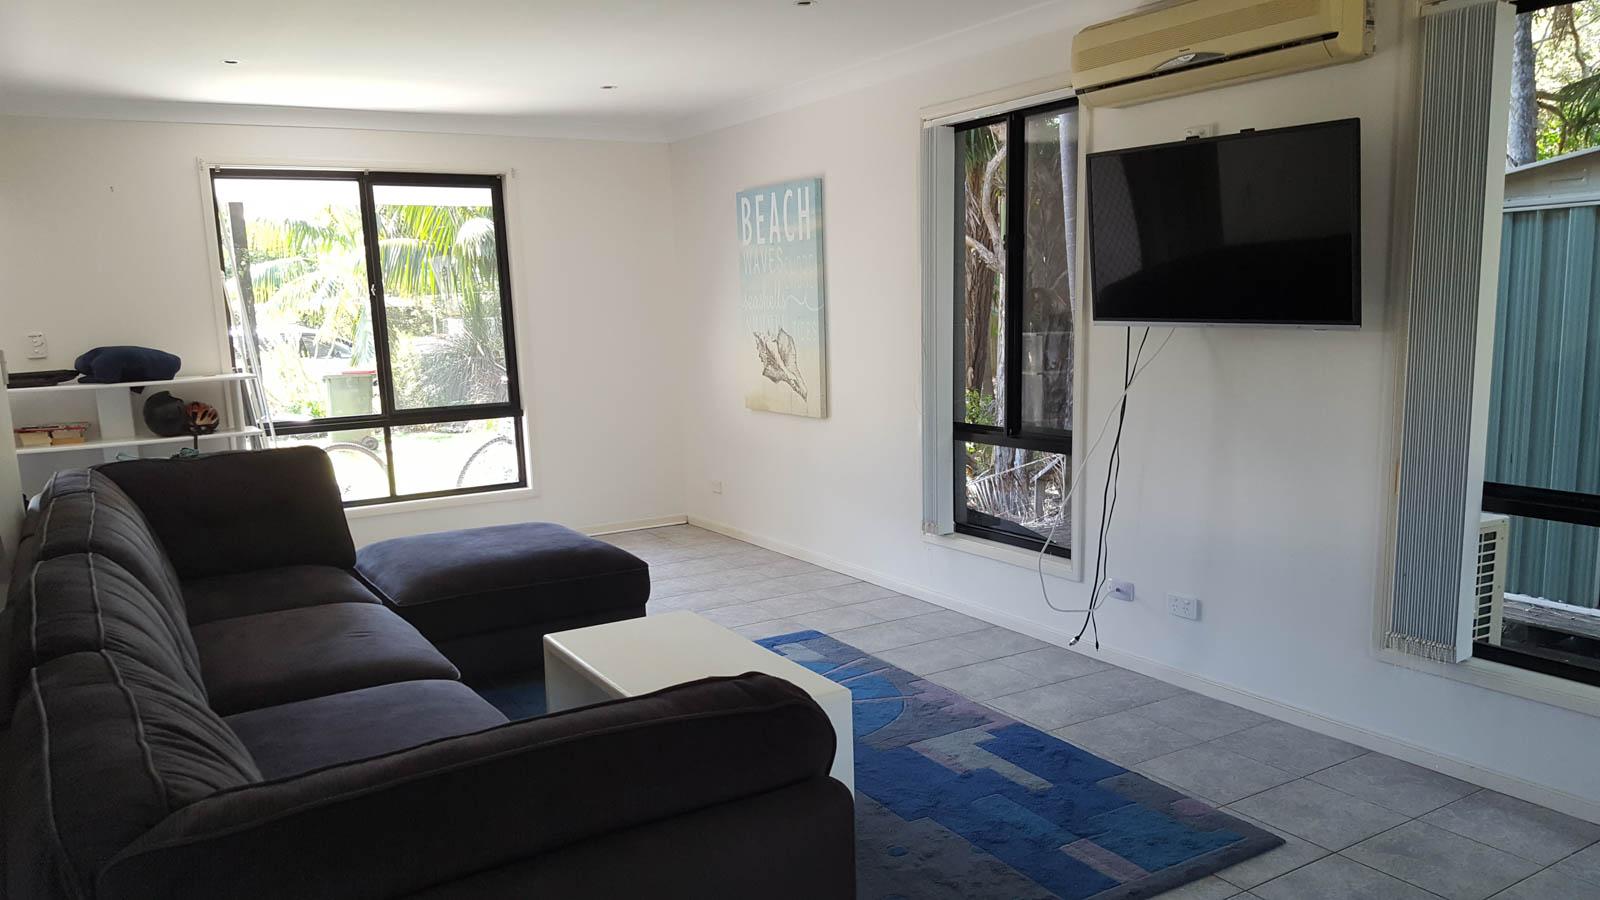 Student_Houses_BBELS_Oakland Lounge Media Room